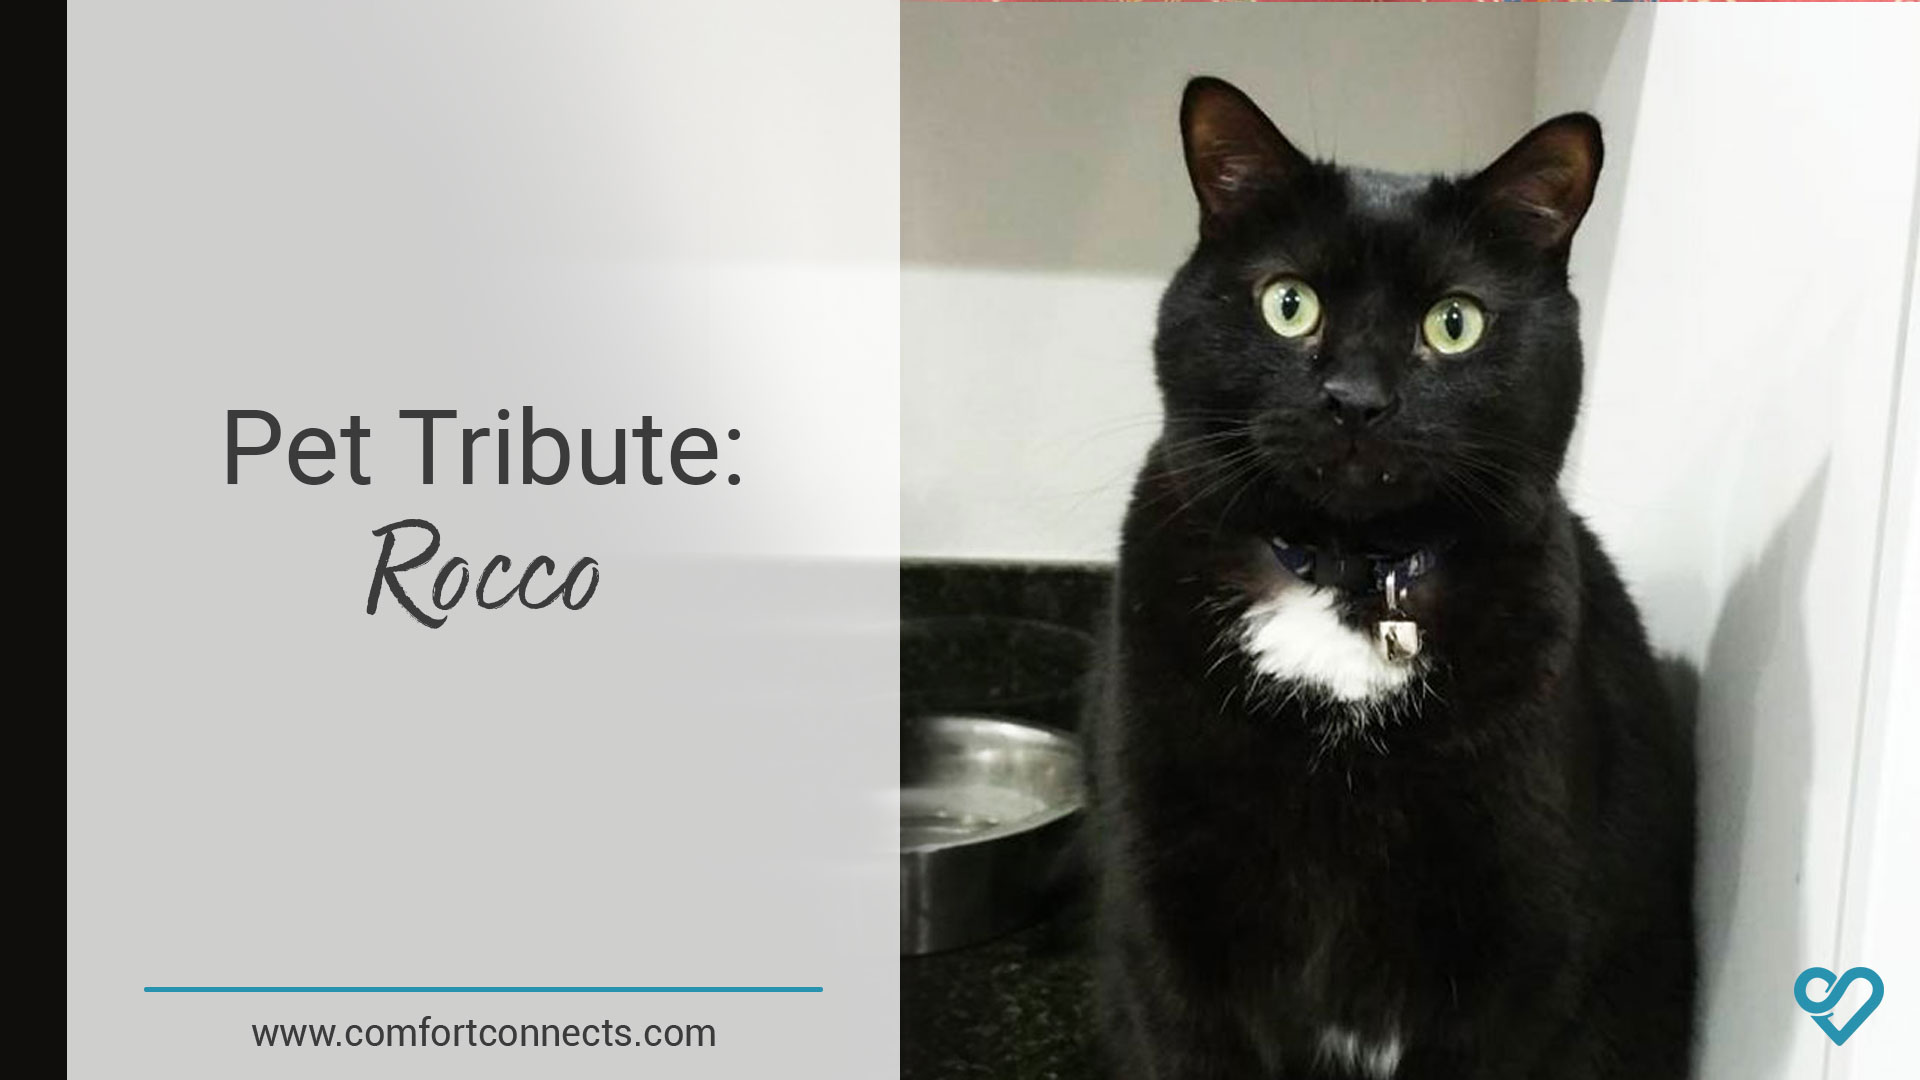 Pet Tribute: Rocco